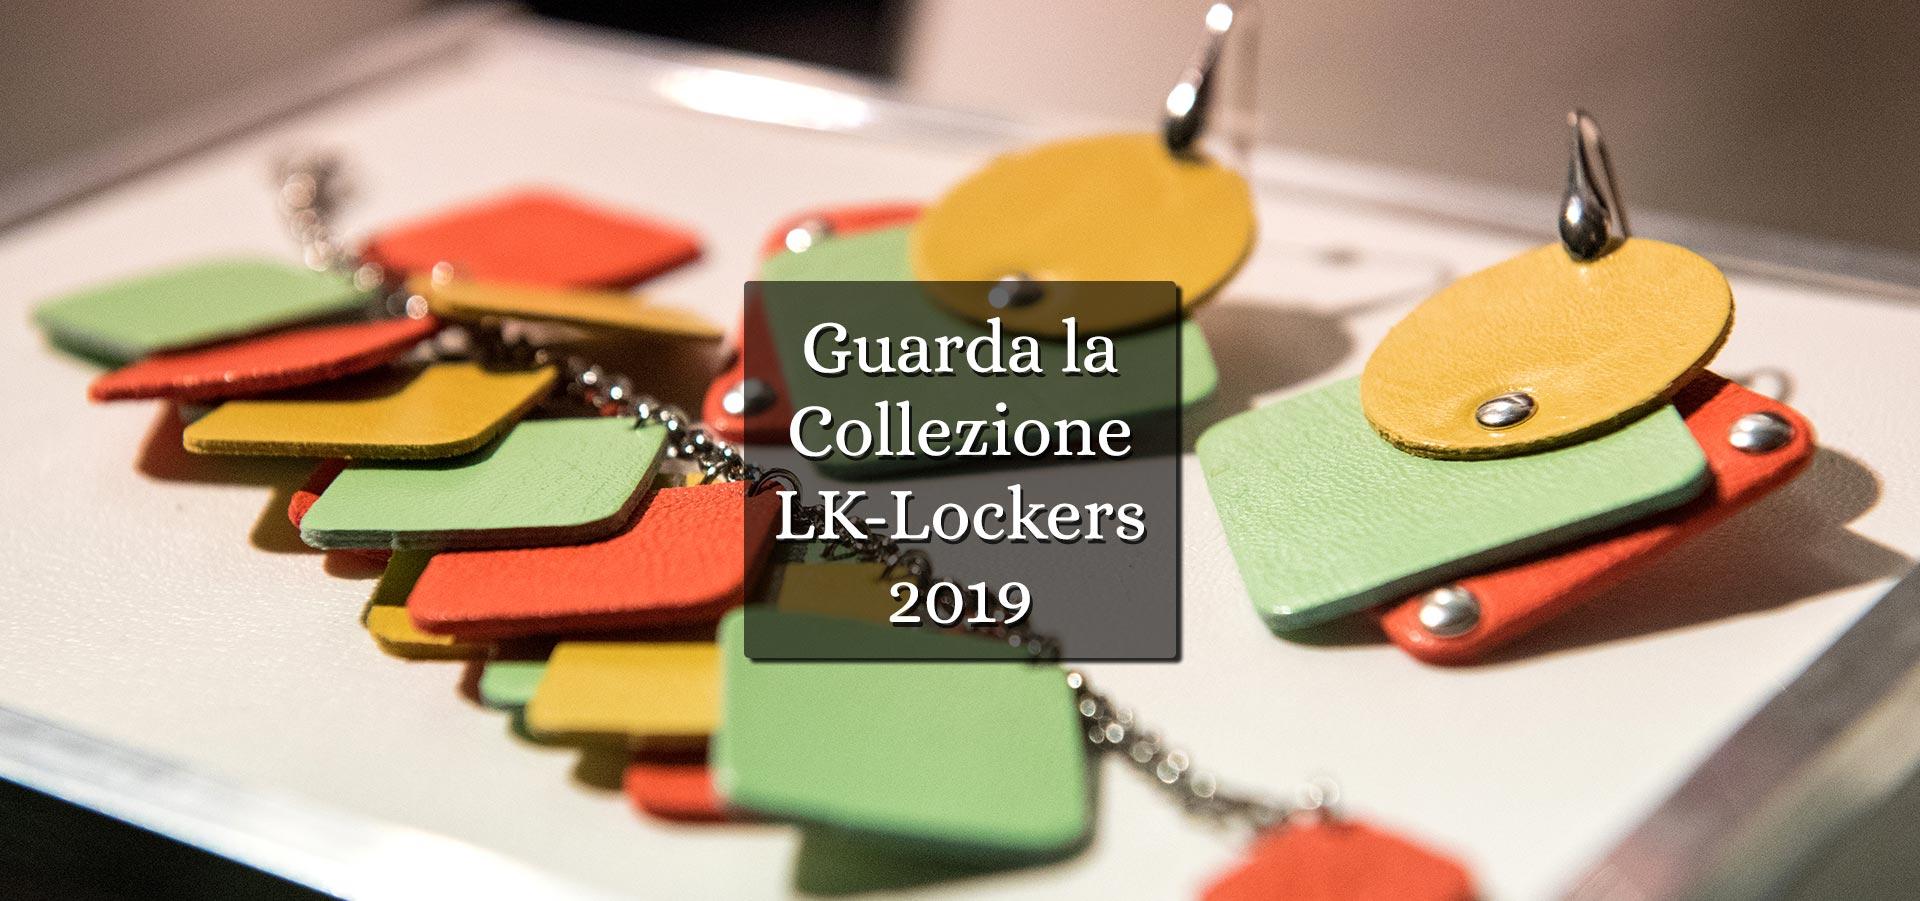 lk-lockers-gioielli-in-pelle-home-slider-004